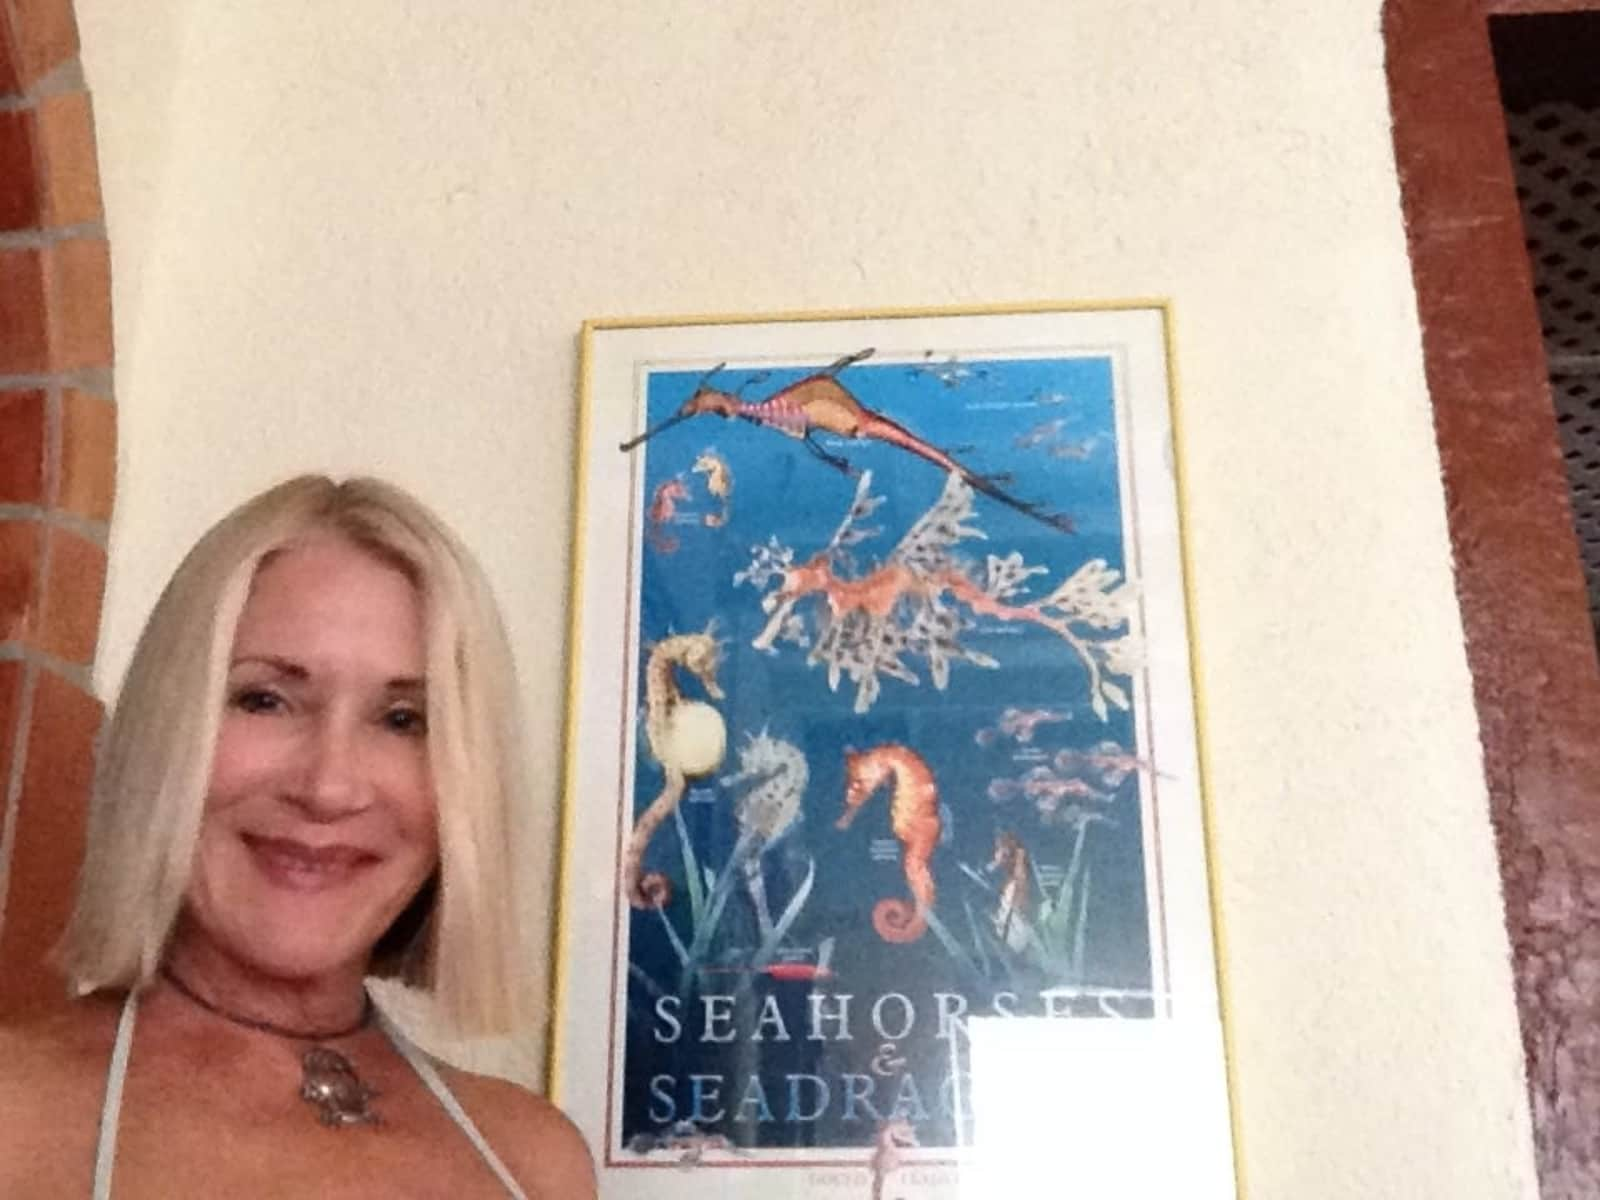 Pam from Phoenix, Arizona, United States